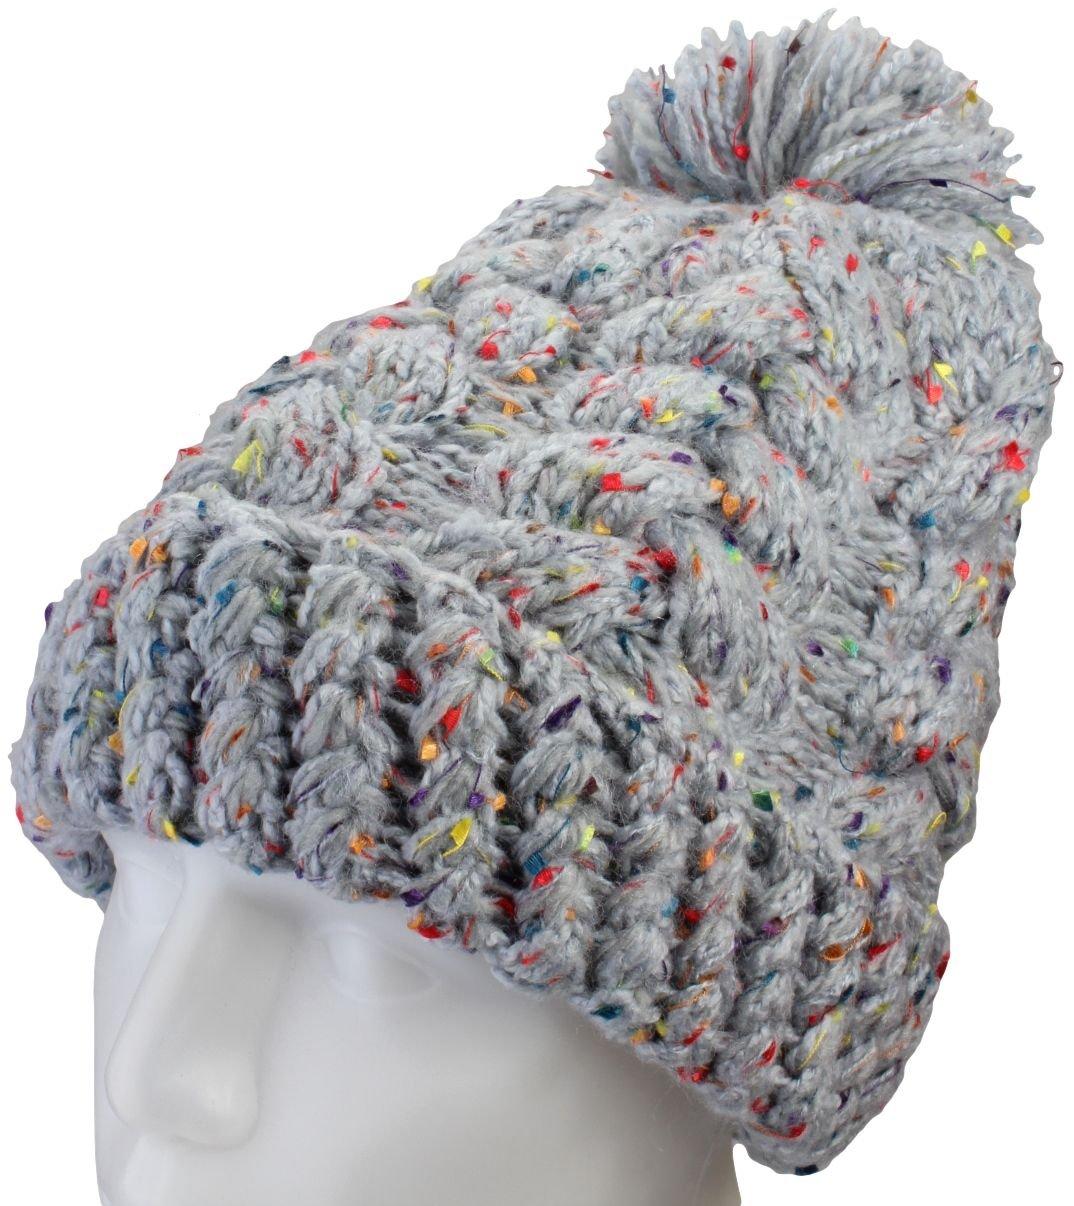 AlexFlittner Designs Gorra Invernal para Mujeres con Puntos/Gorra ...